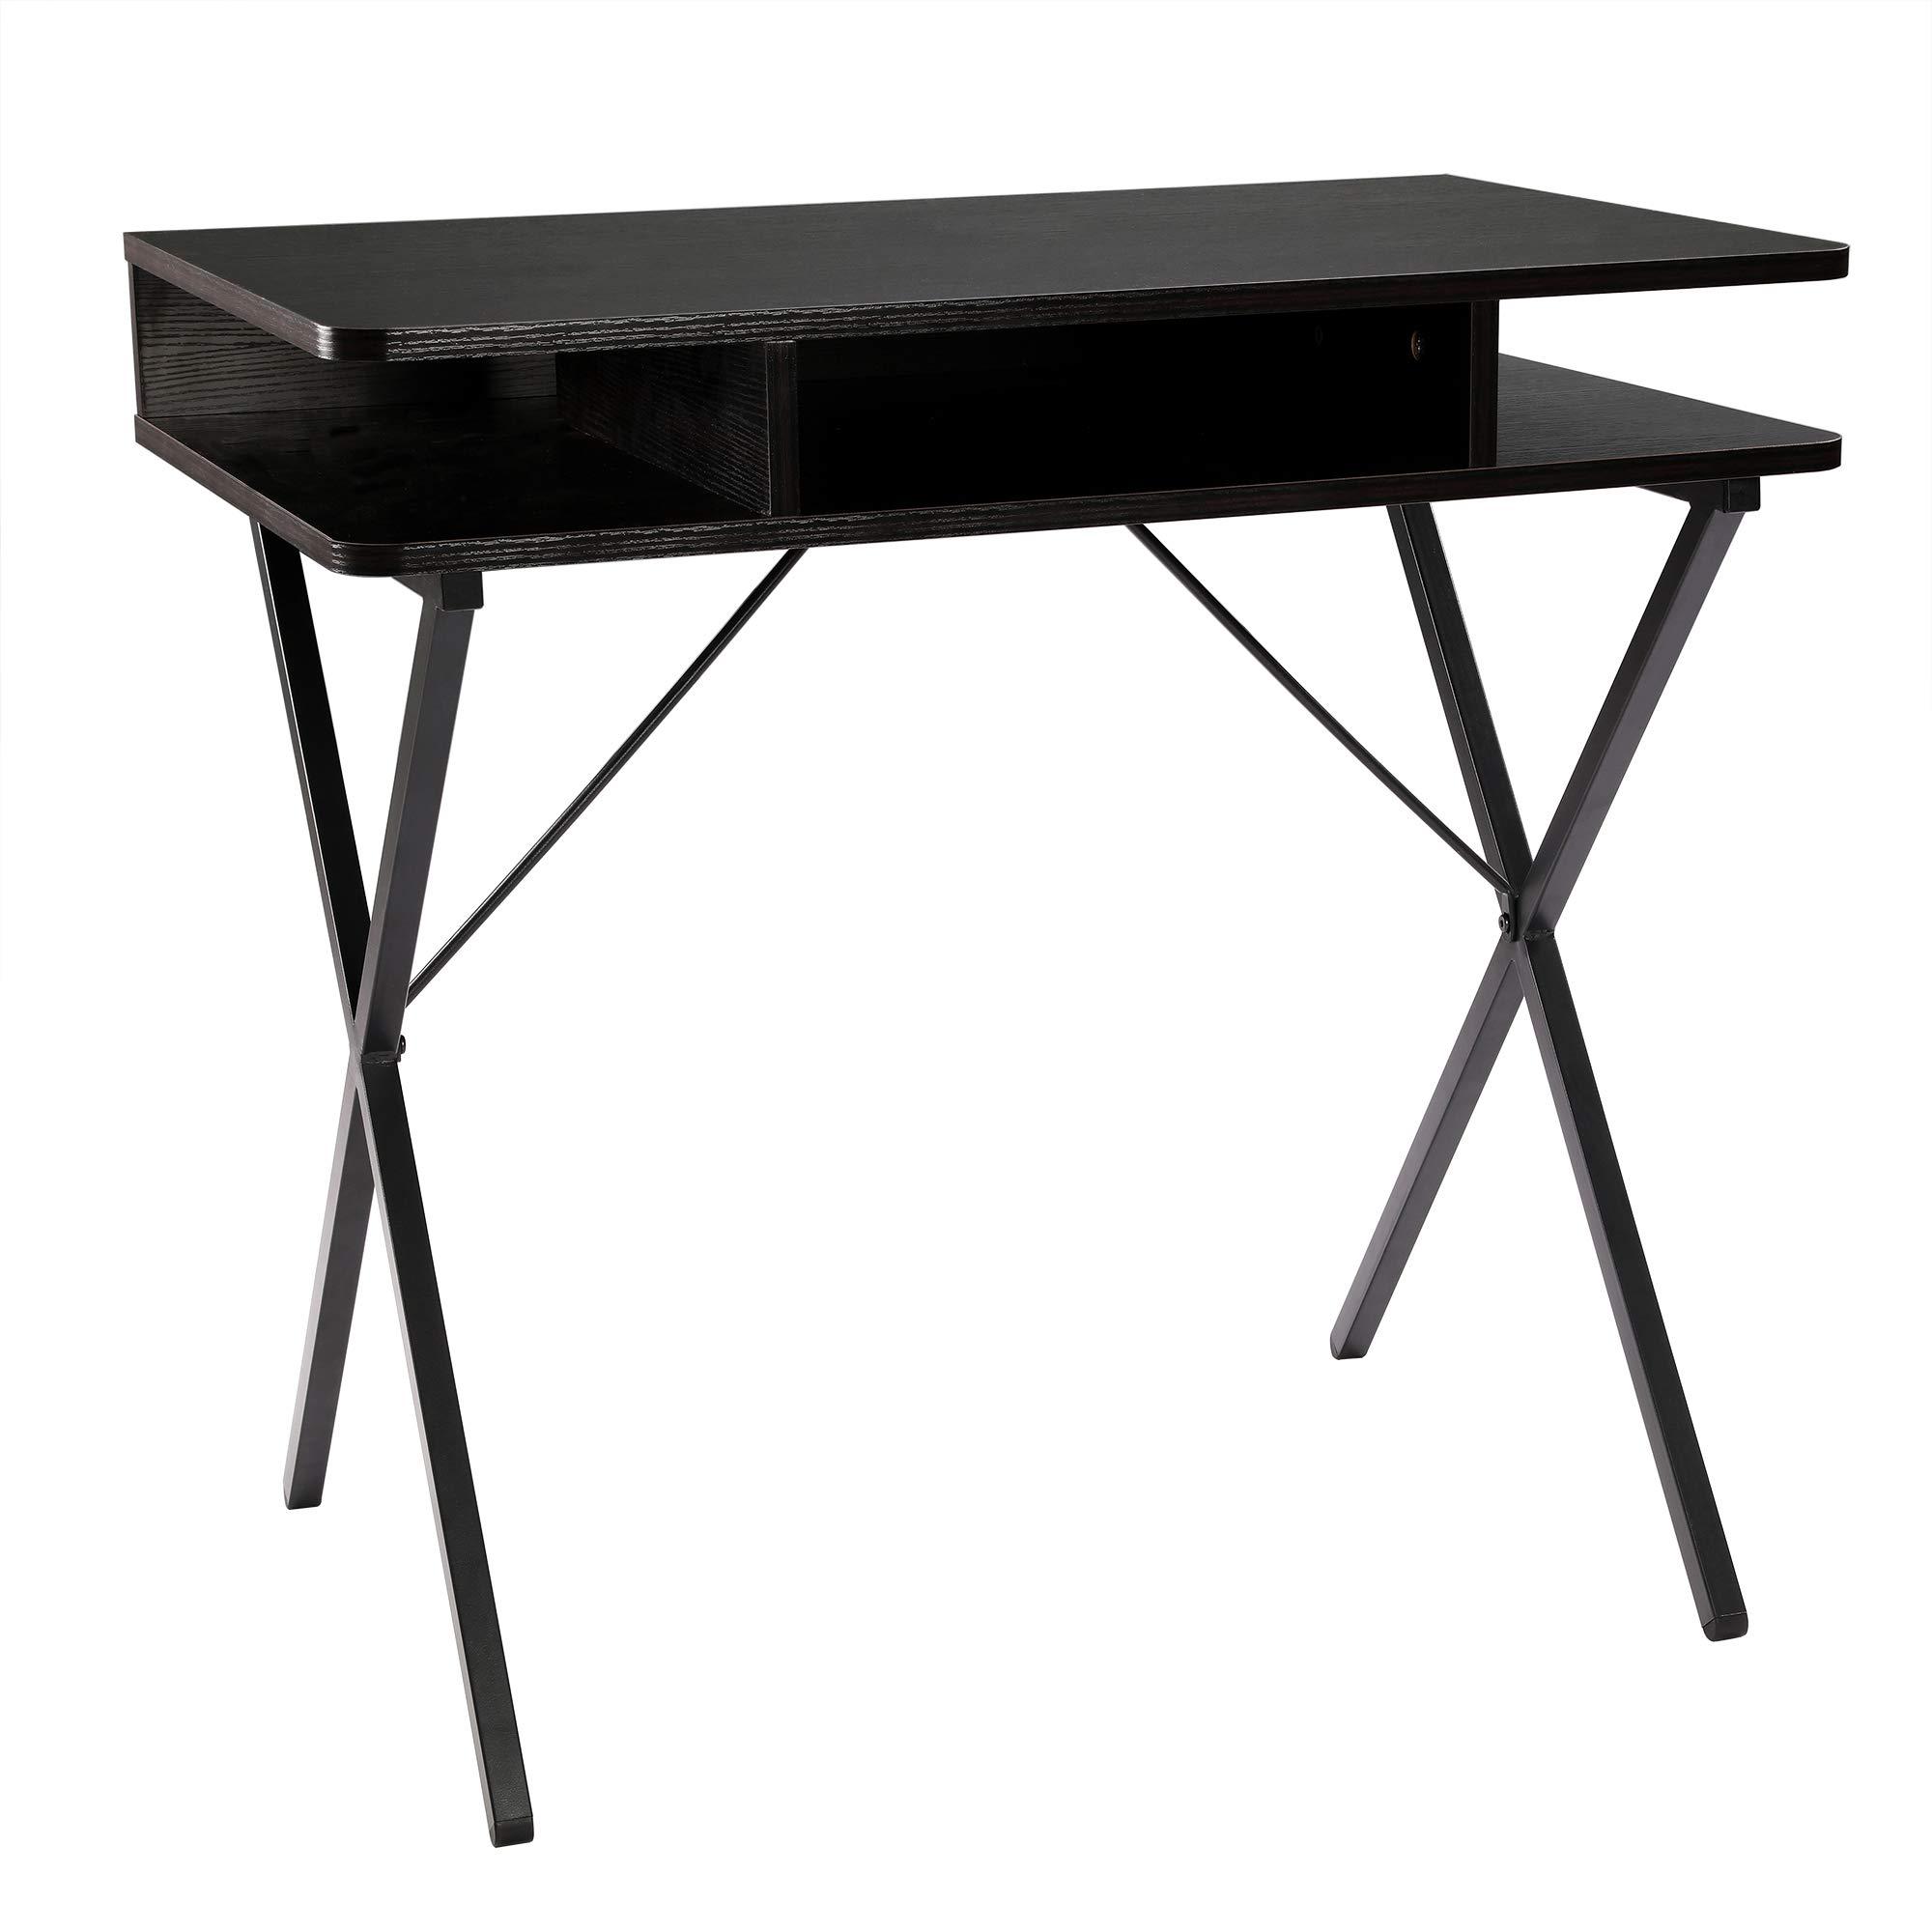 FIVEGIVEN Small Brownish Black Desk Modern Writing Computer Desk with Storage, 31.5 Inch